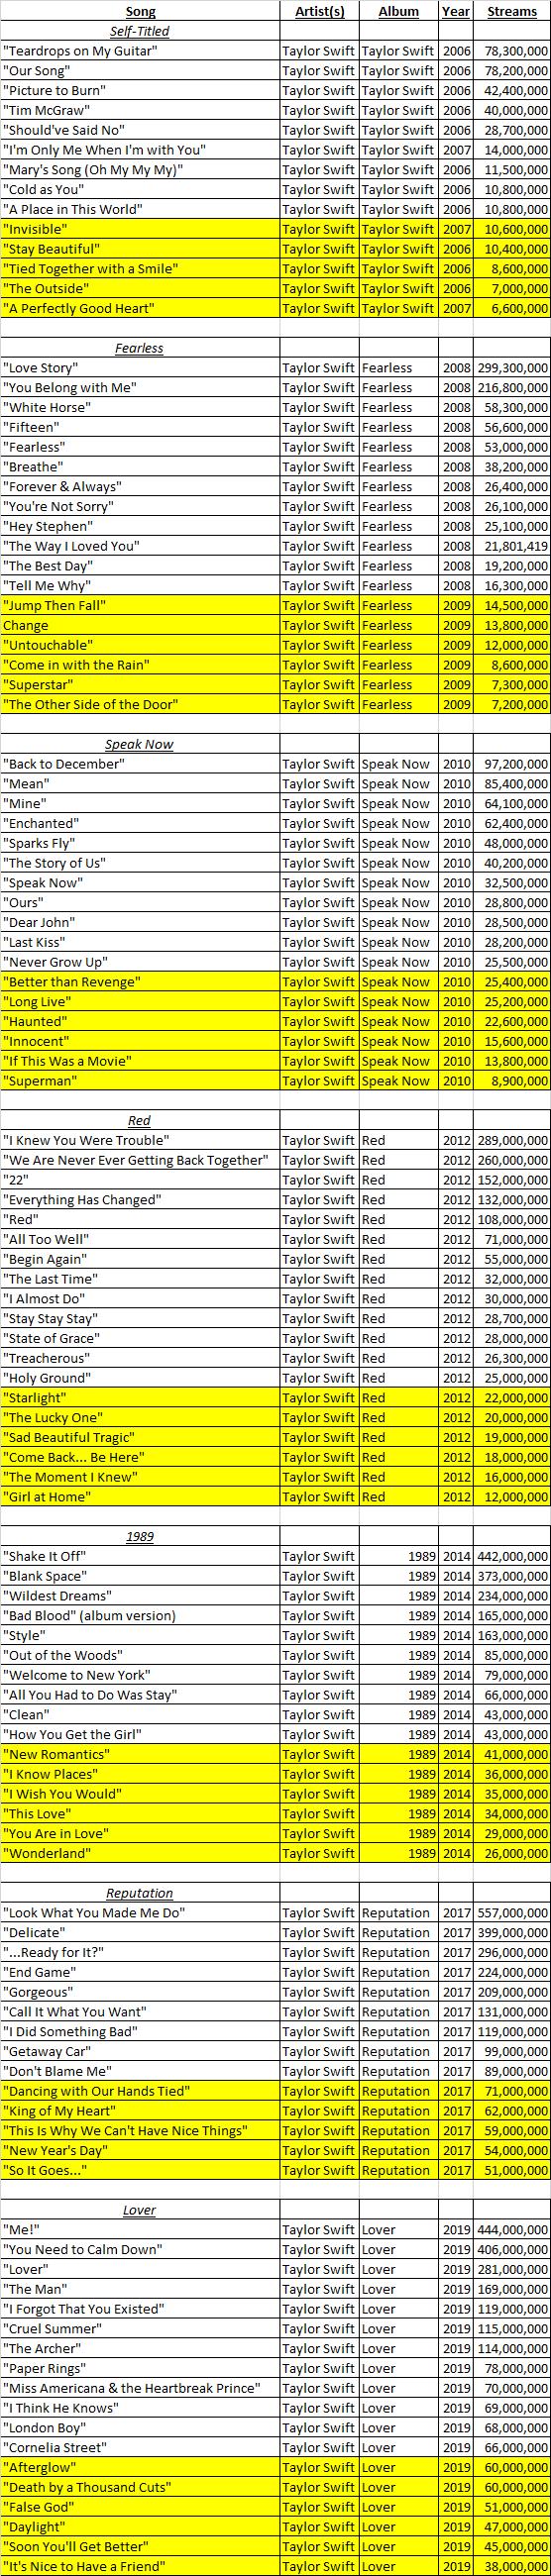 Taylor Swift's Spotify Streams as of 6/2020